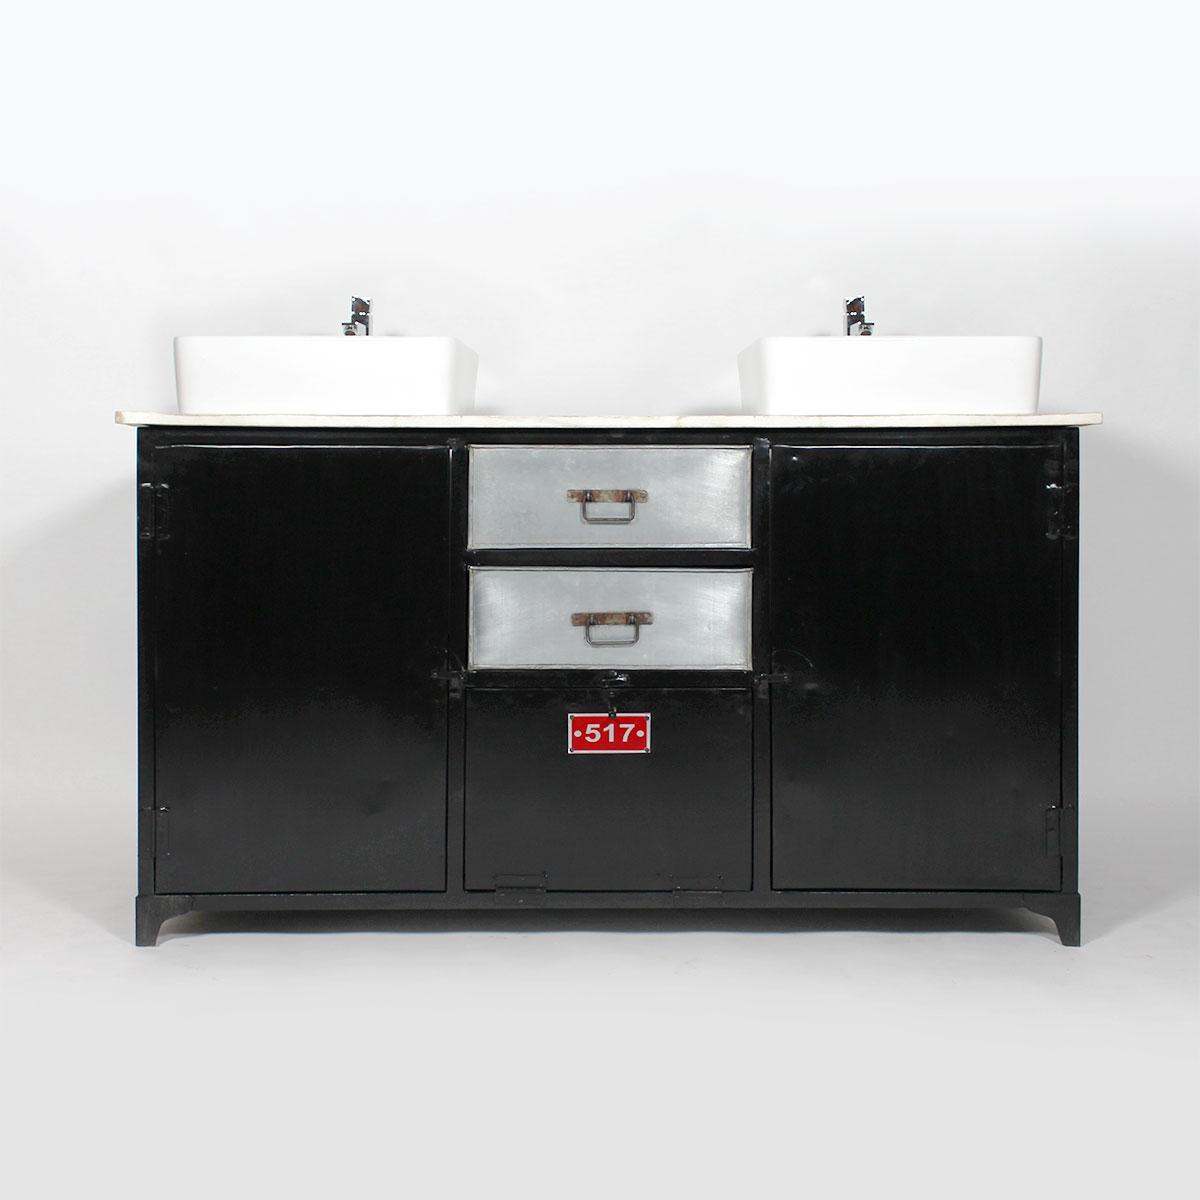 Conseils d co pour choisir son meuble salle de bain metal - Selection meubles accessoires tendance chez dawanda ...